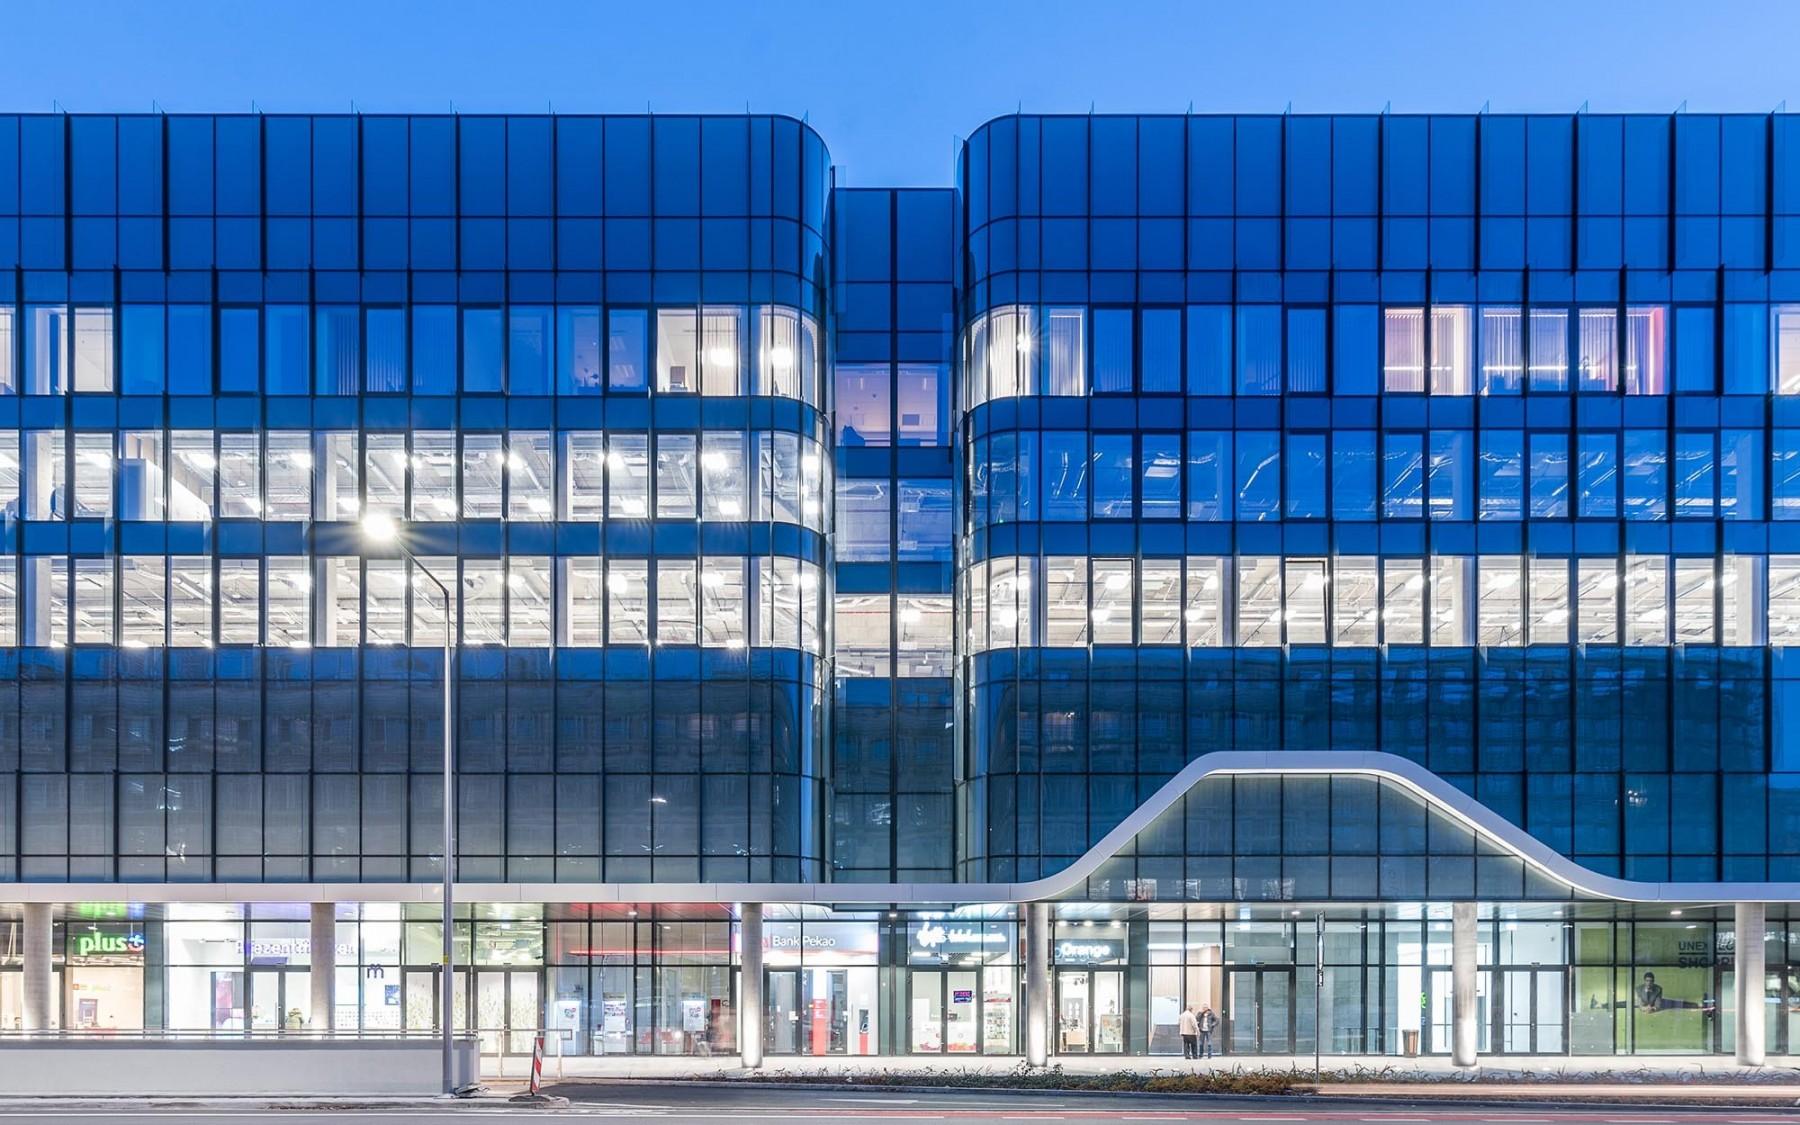 imb-asymetria-wroclavia-shopping-center.jpg